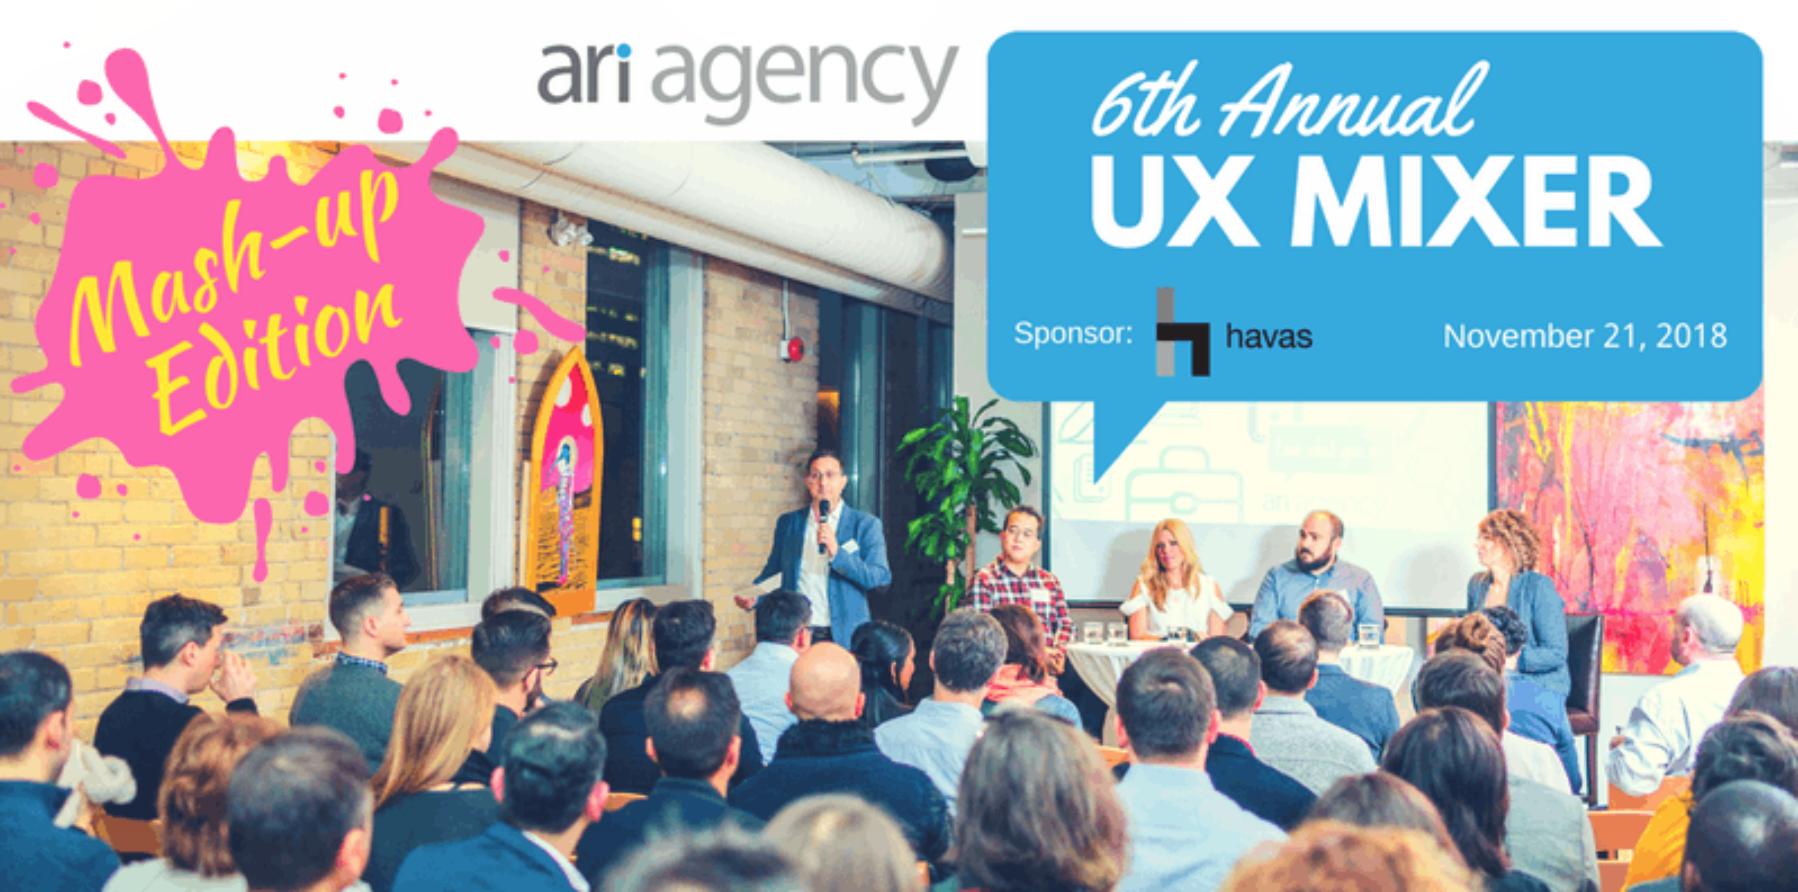 Ari Agency's 6th Annual UX Mixer